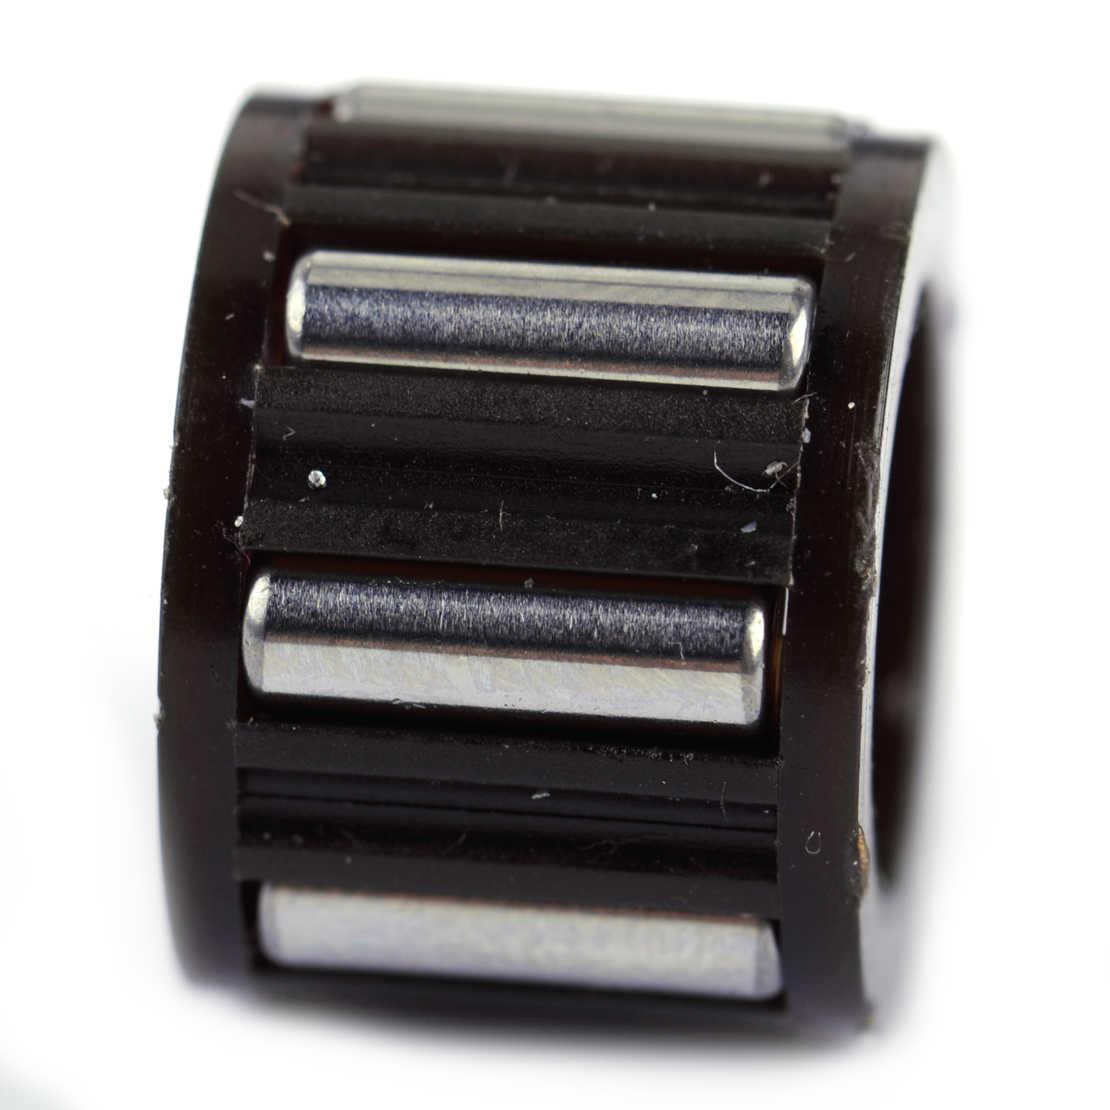 Letaosk Hoge Kwaliteit Zuiger Pols Pin Naald Kooi Clutch Lager Fit Voor Stihl 066 Ms660 064 Kettingzaag